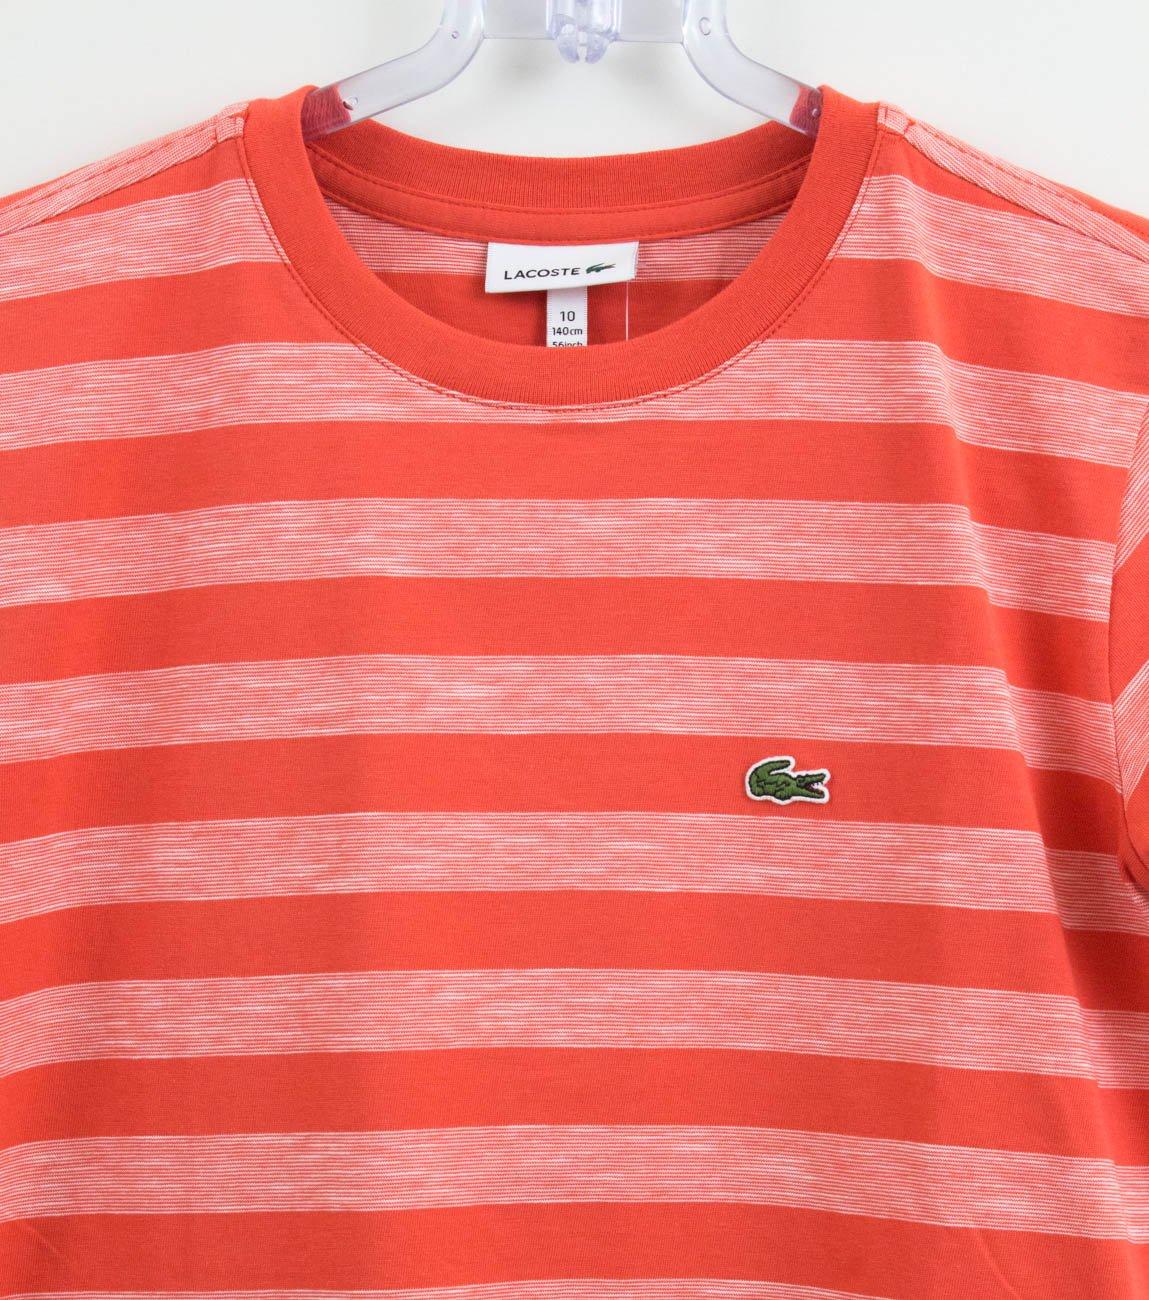 45c4934355f Camiseta Lacoste Infantil Menino Listras Laranja - Xuá Kids